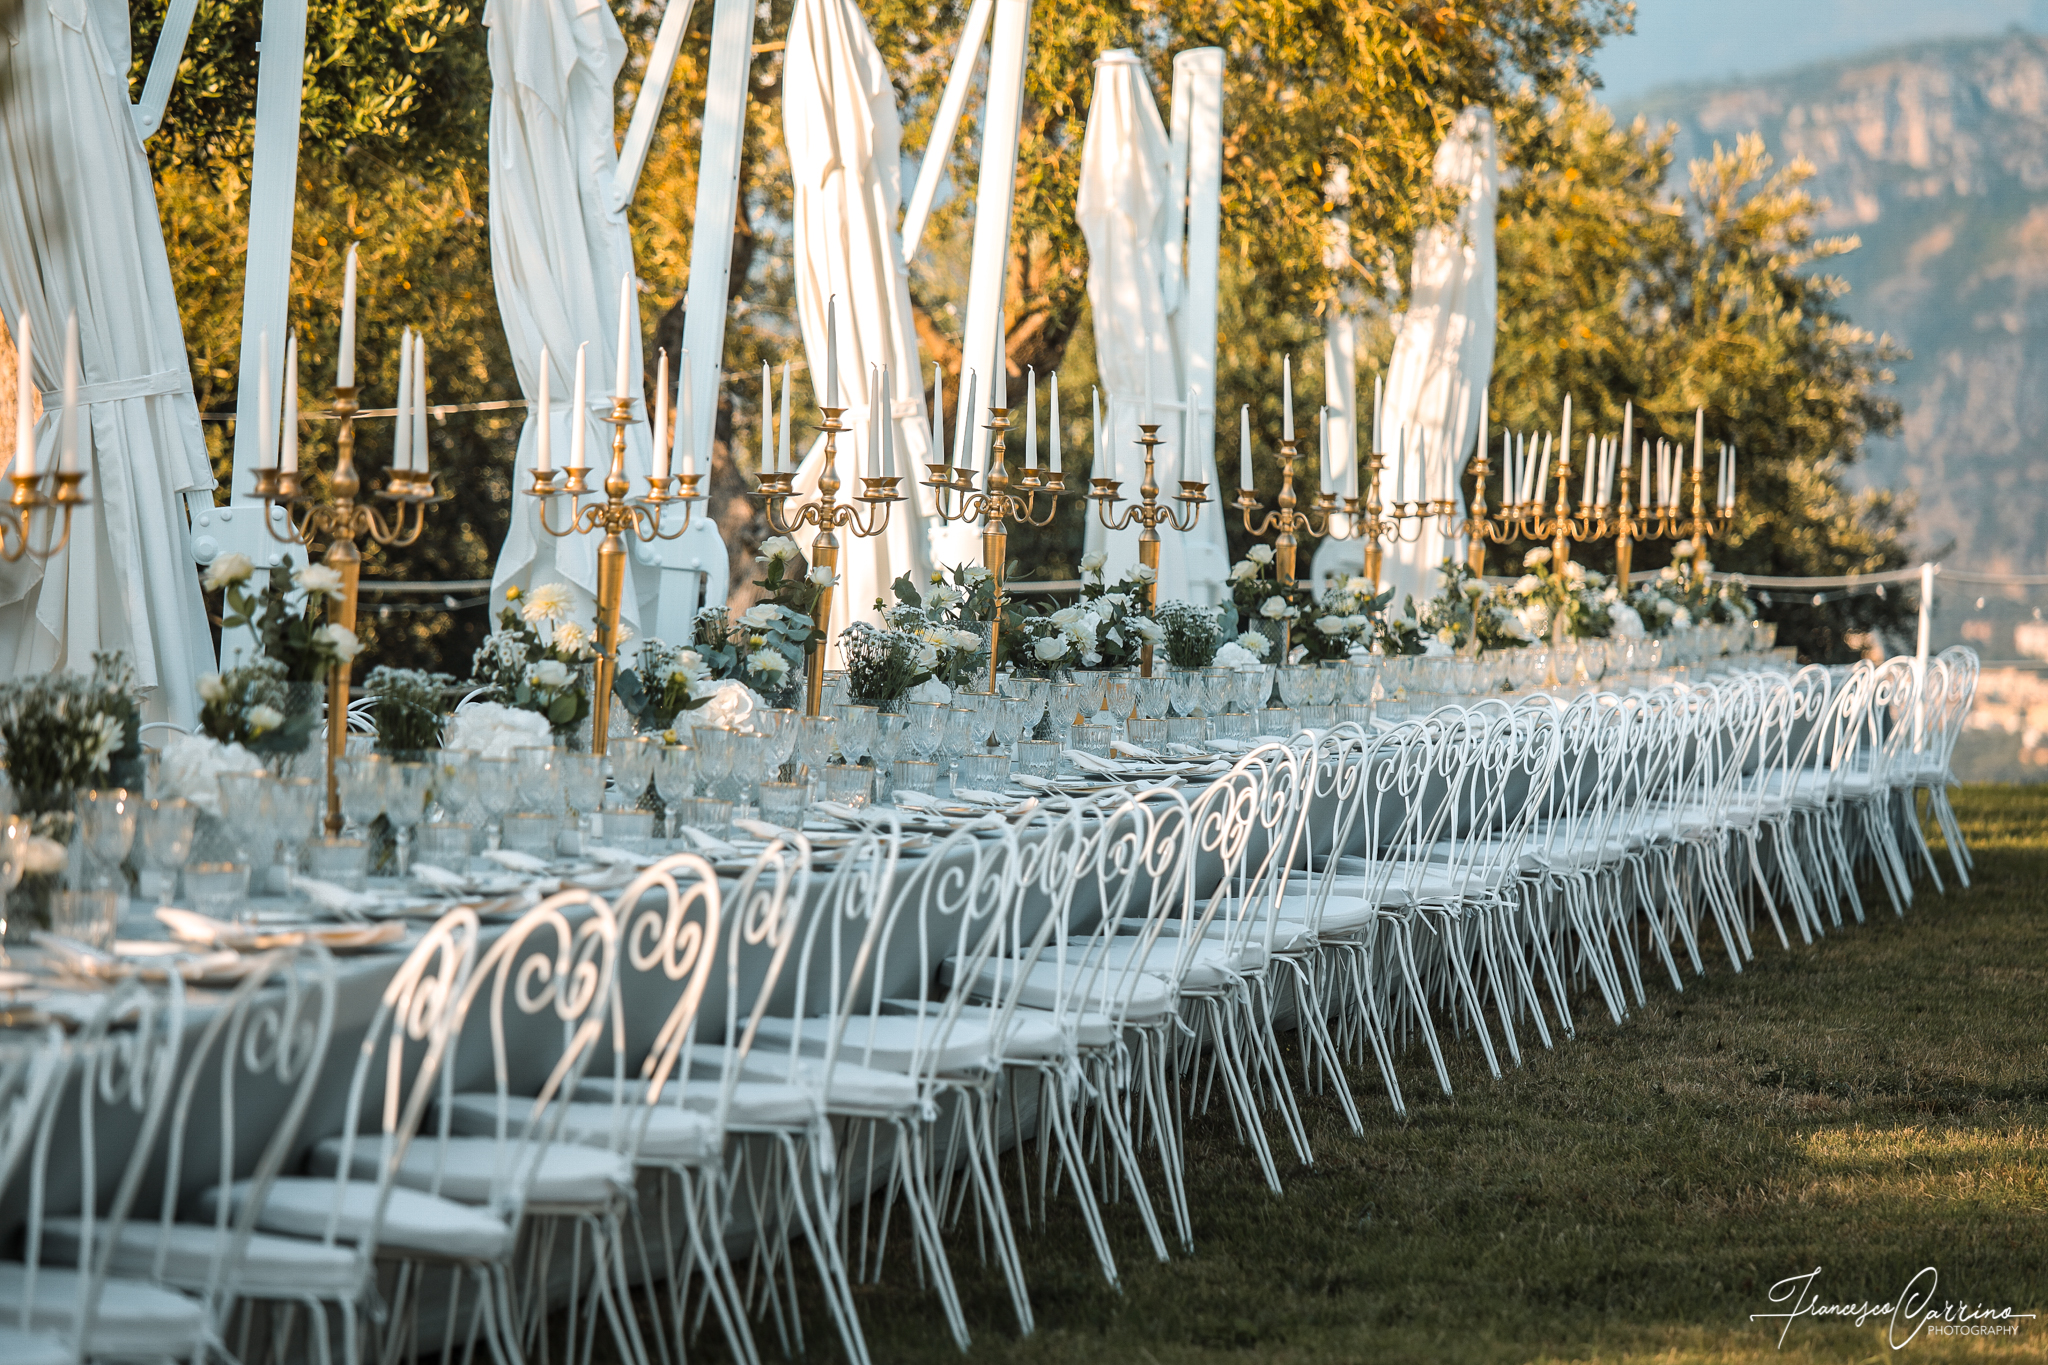 http://www.weddingamalfi.com/wp-content/uploads/Giannenza-13-luglio-2019-2.jpg